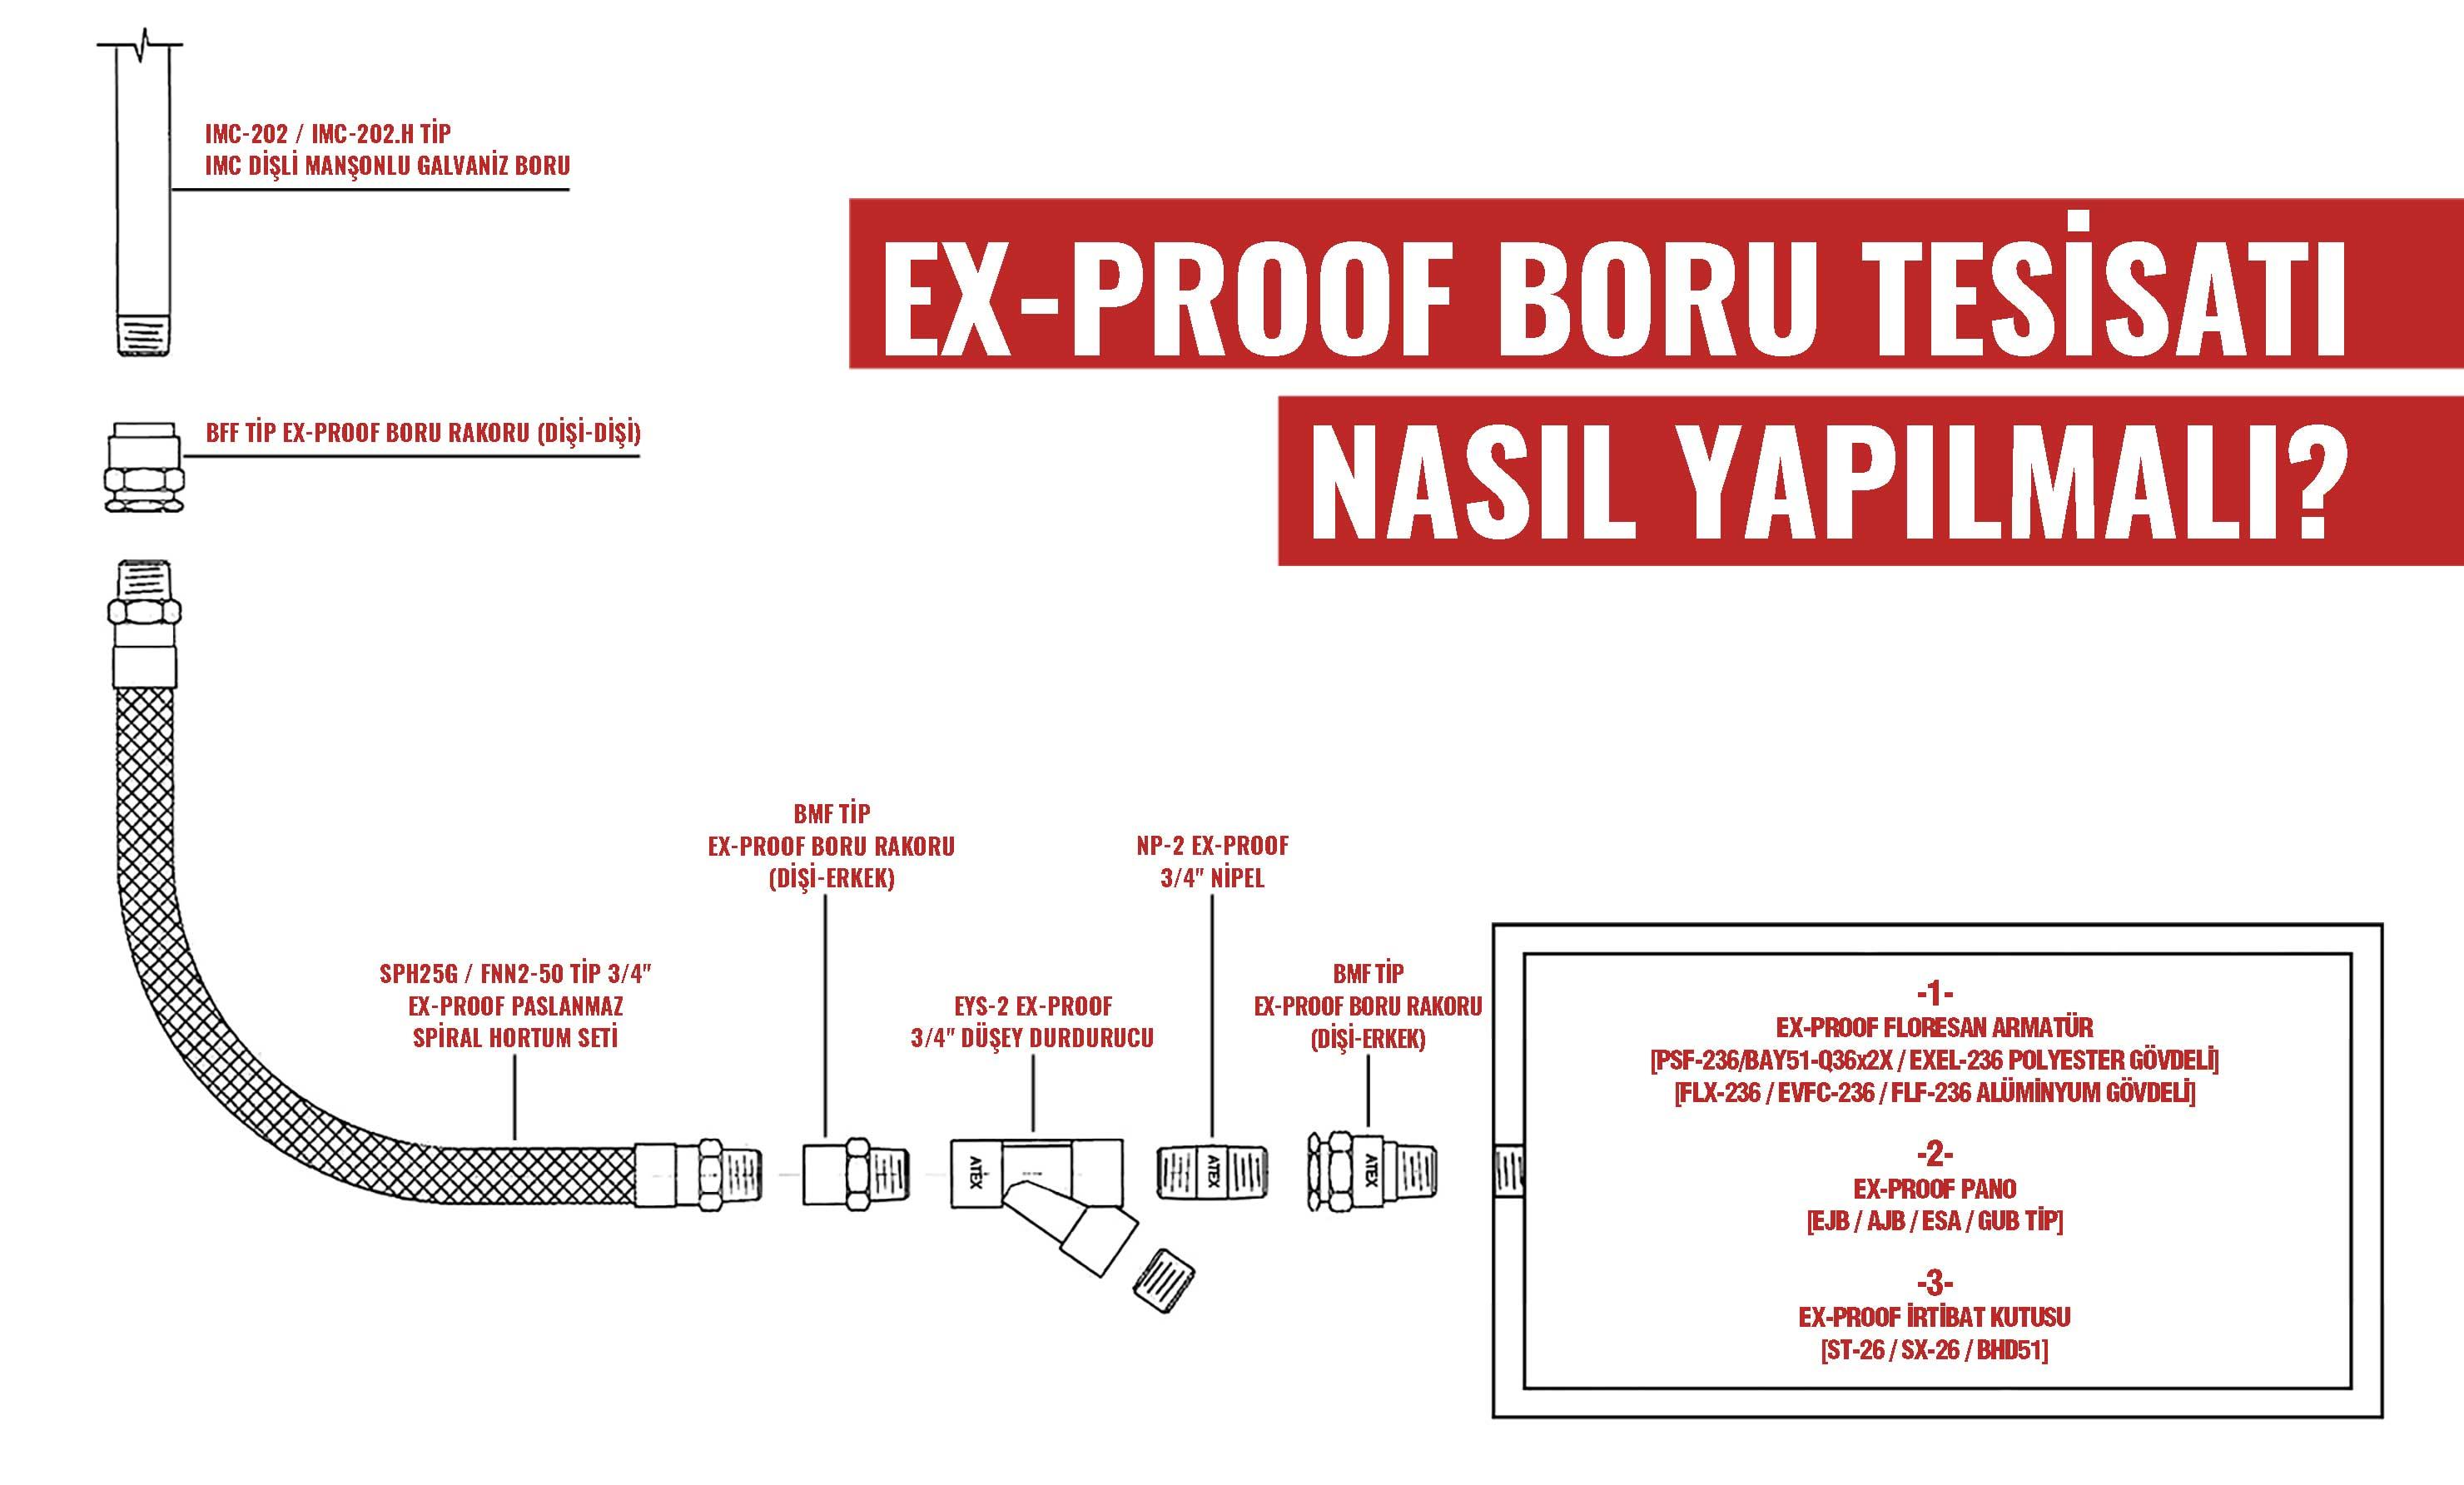 ex-proof-boru-tesisati-nasil-yapilmali